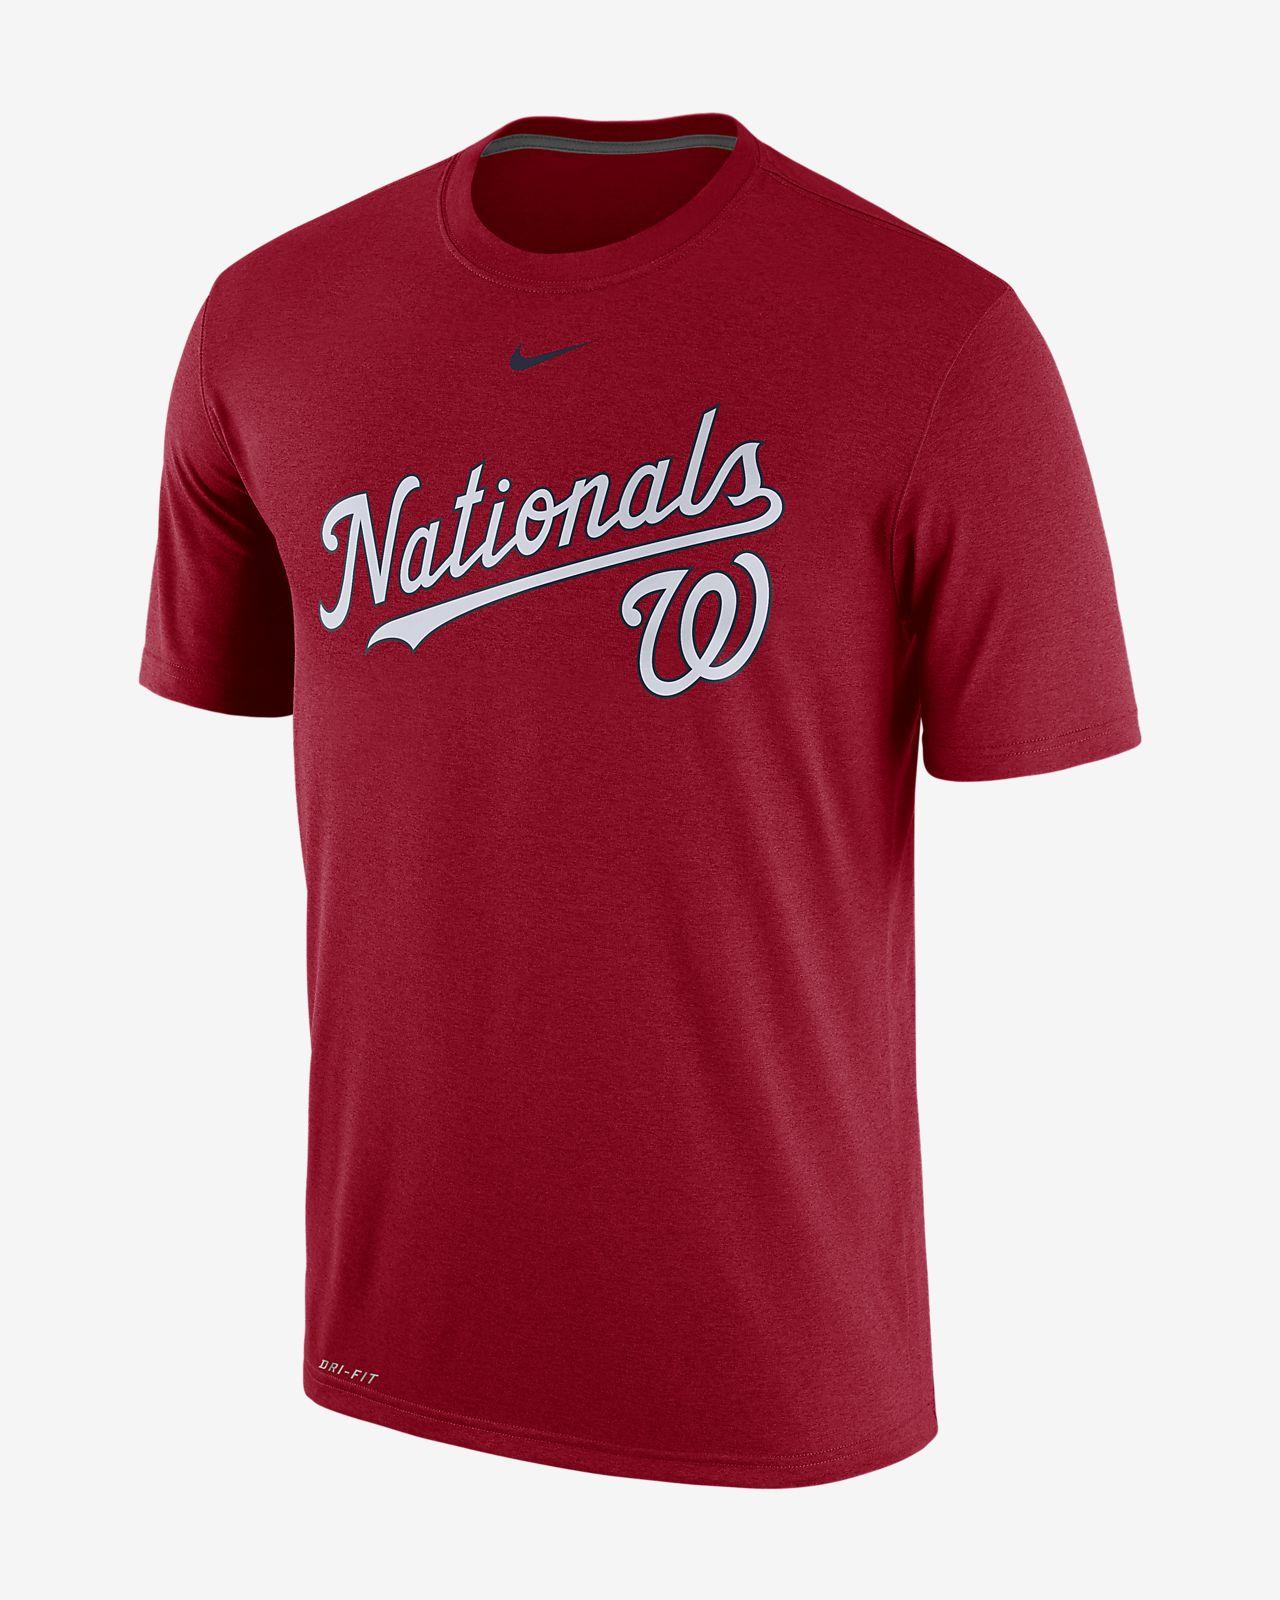 Nike Logo Legend (MLB Nationals) Men's T-Shirt